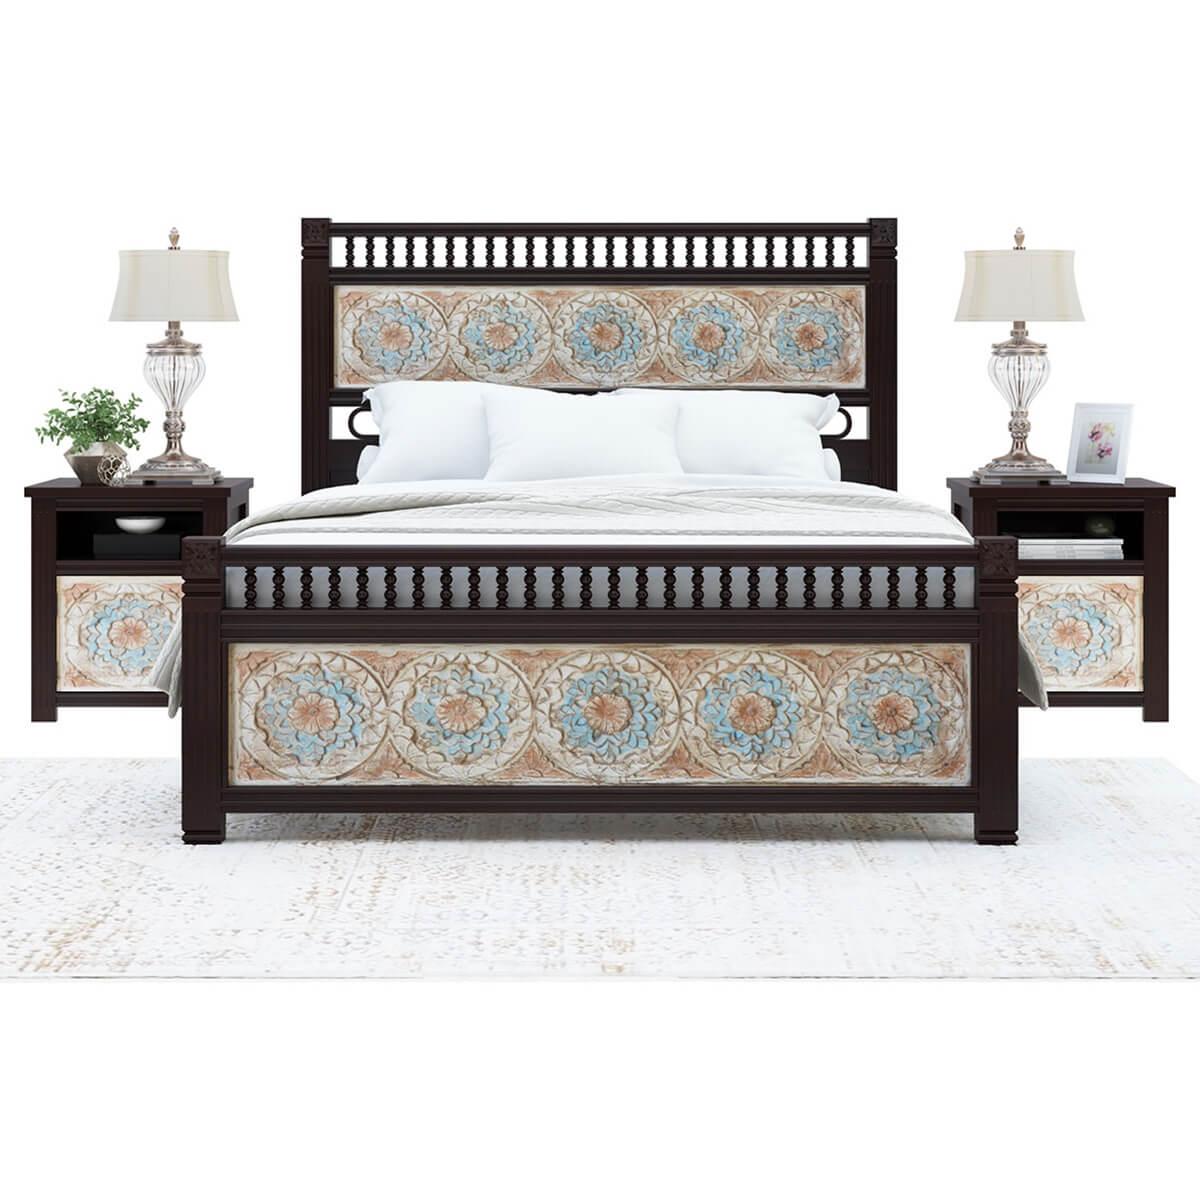 English garden mango wood hand carved platform bed w foot